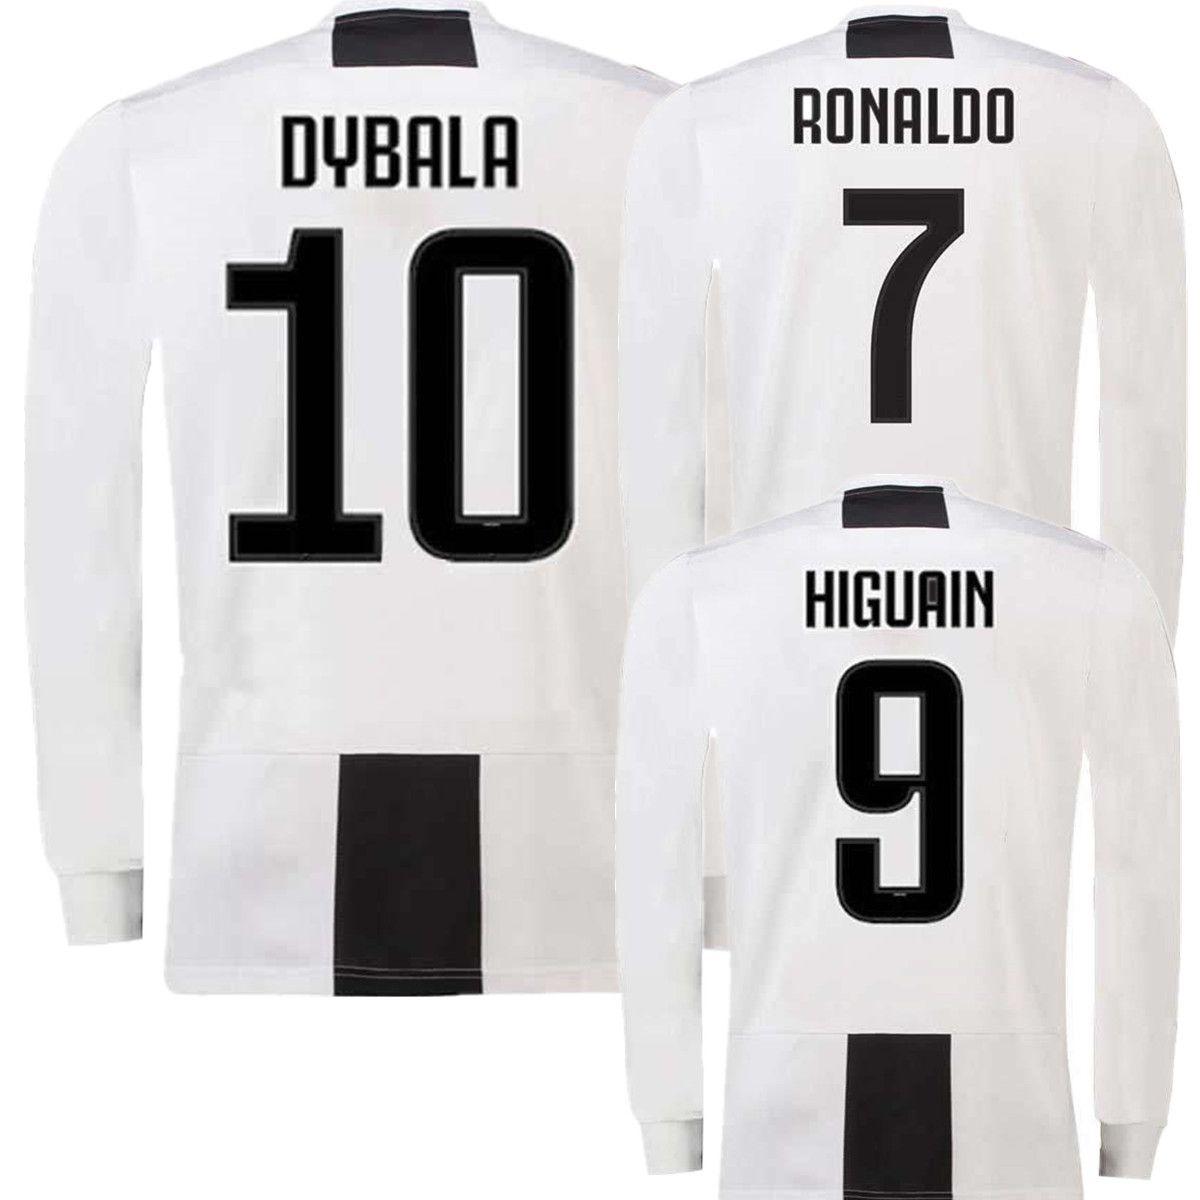 9c0269981 Long Sleeve JUVS Home Soccer Jersey 18 19  7 RONALDO  10 DYBALA ...